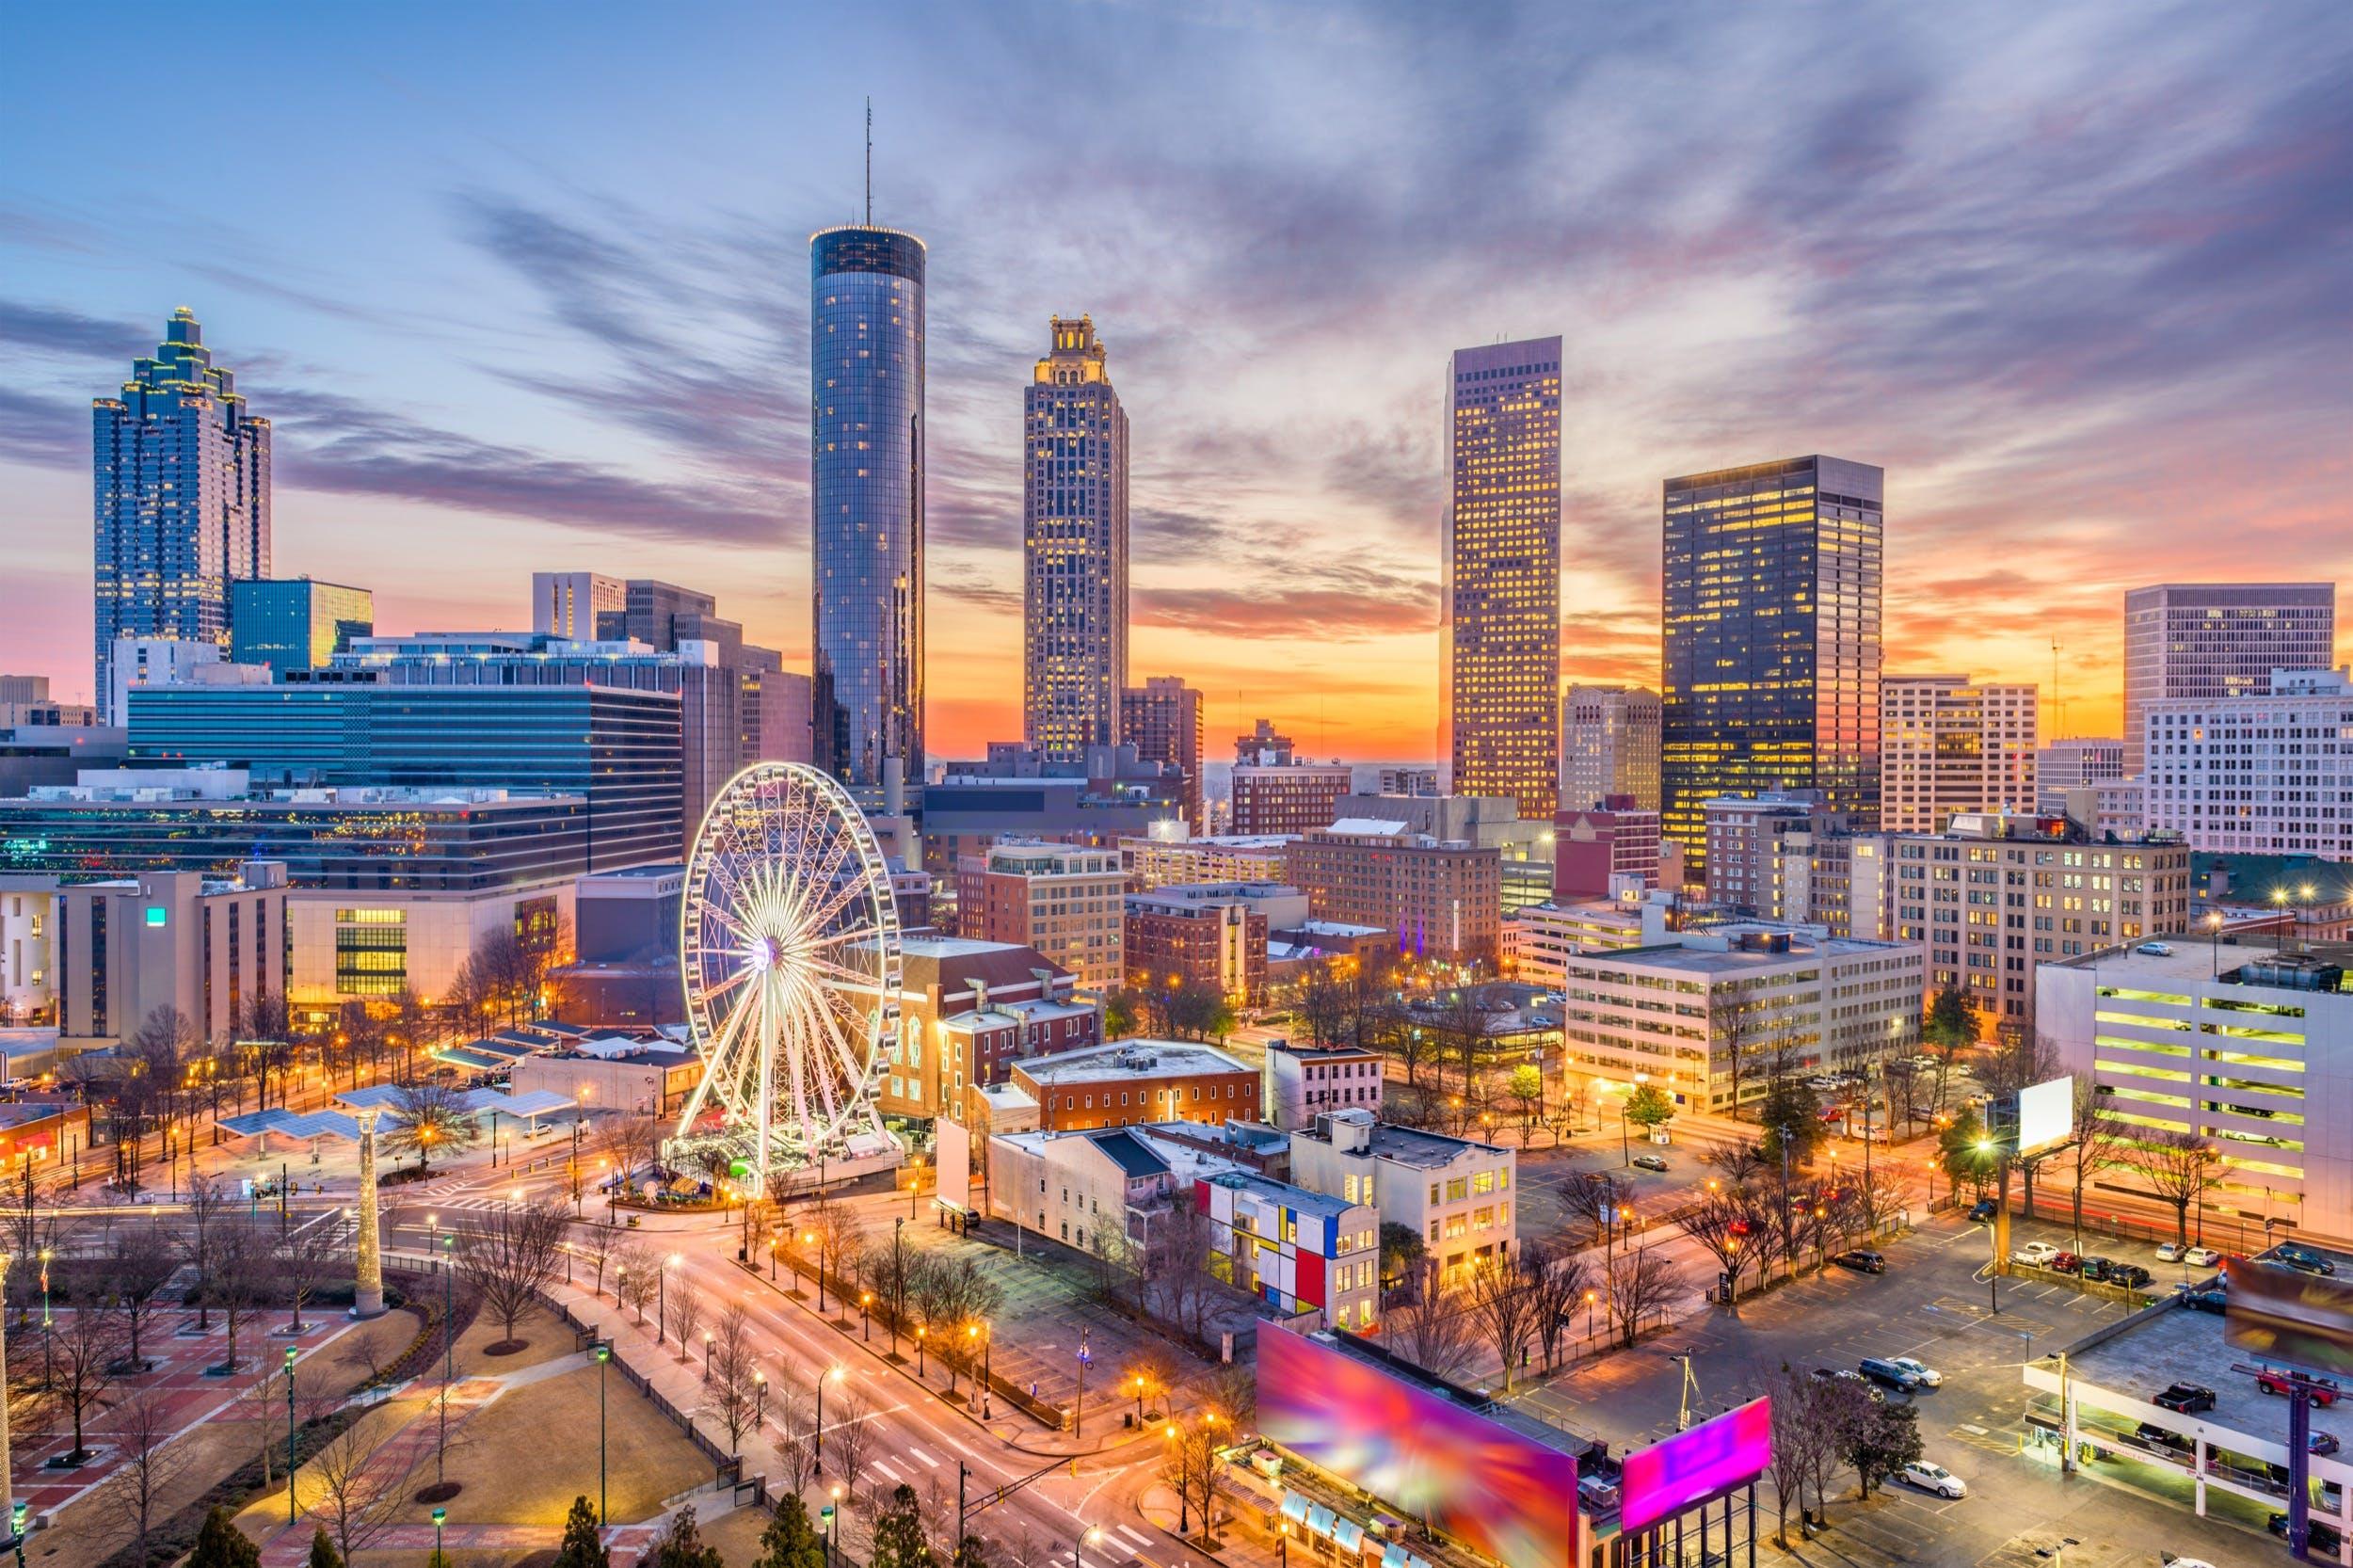 VITRONIC Atlanta